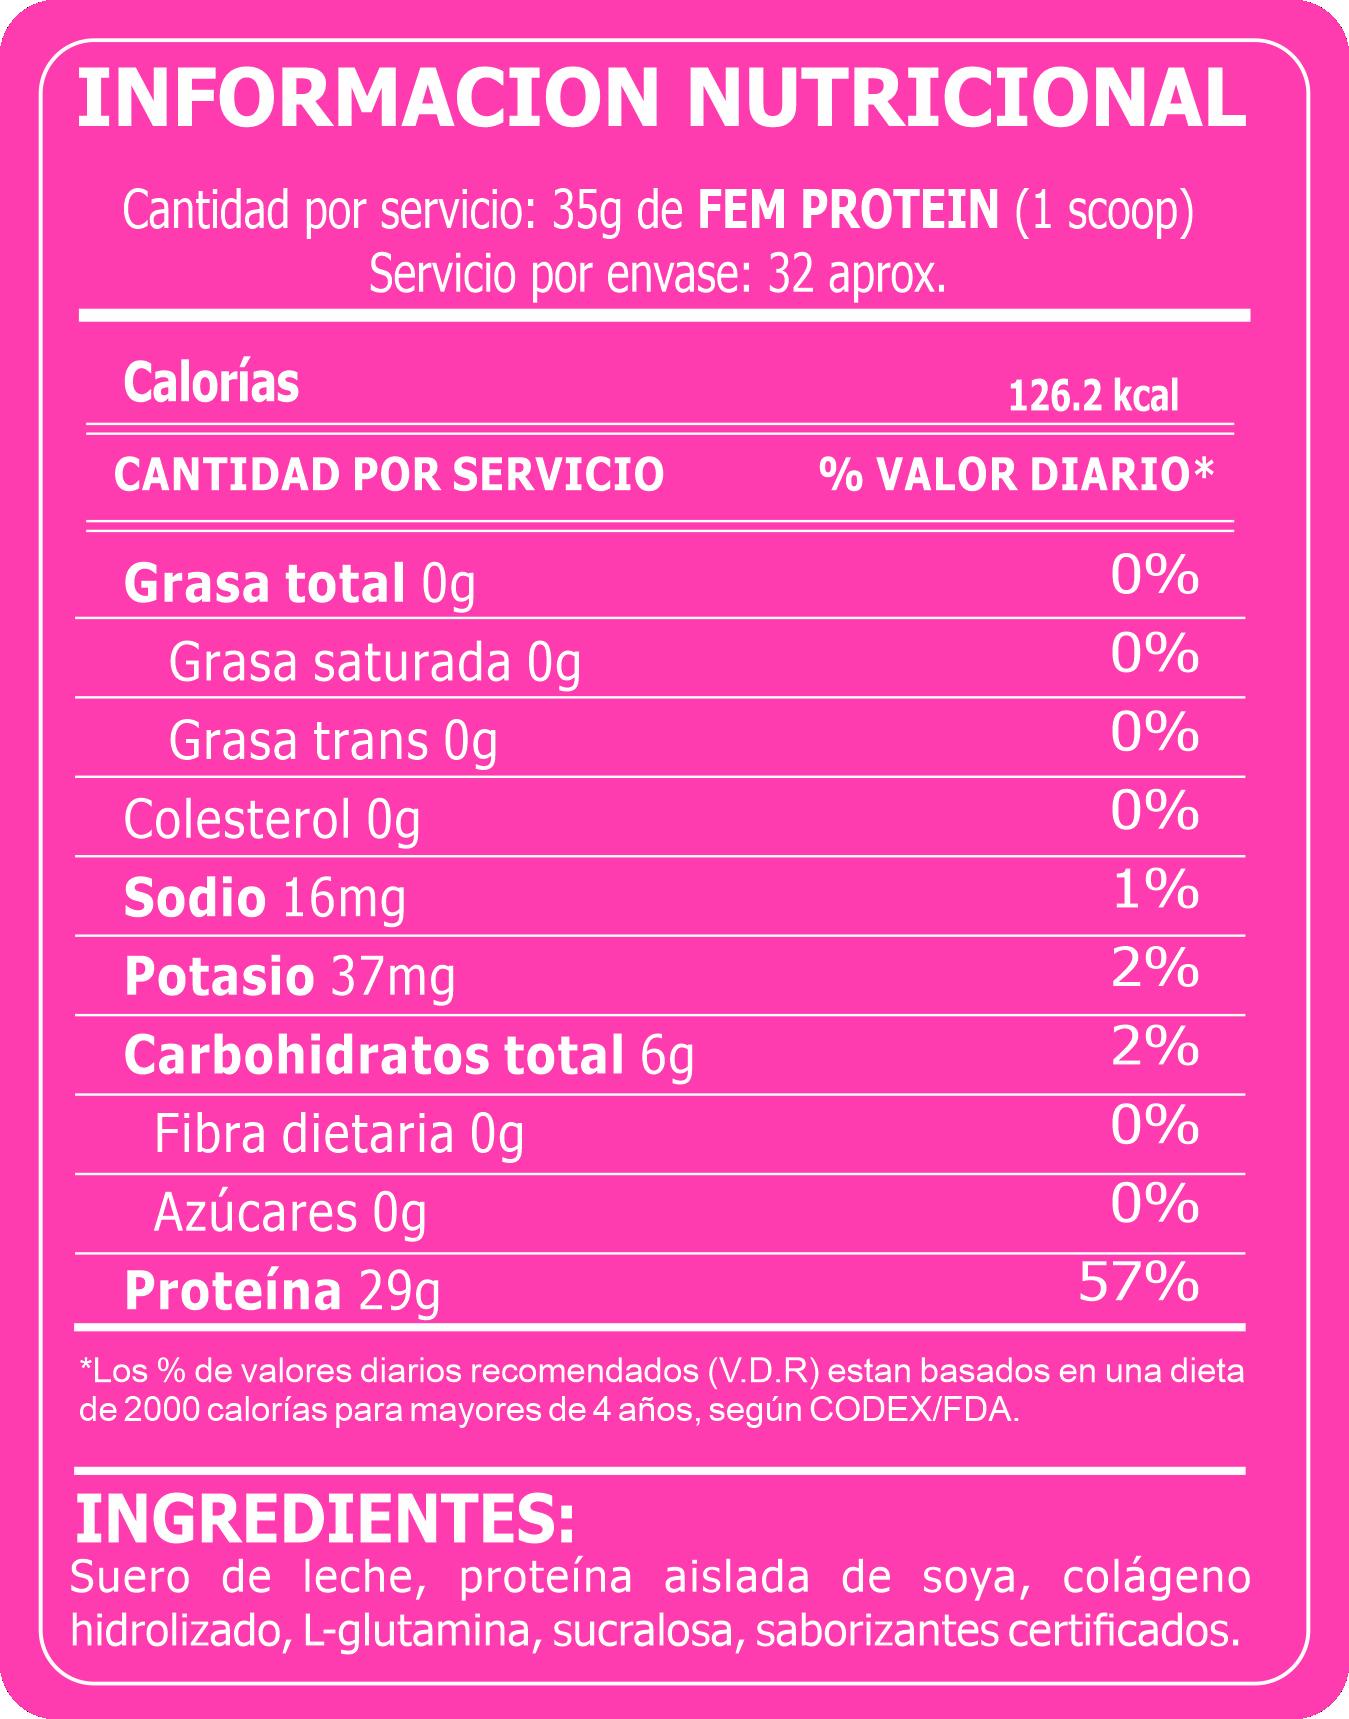 Tabla Nutricional FEM PROTEIN